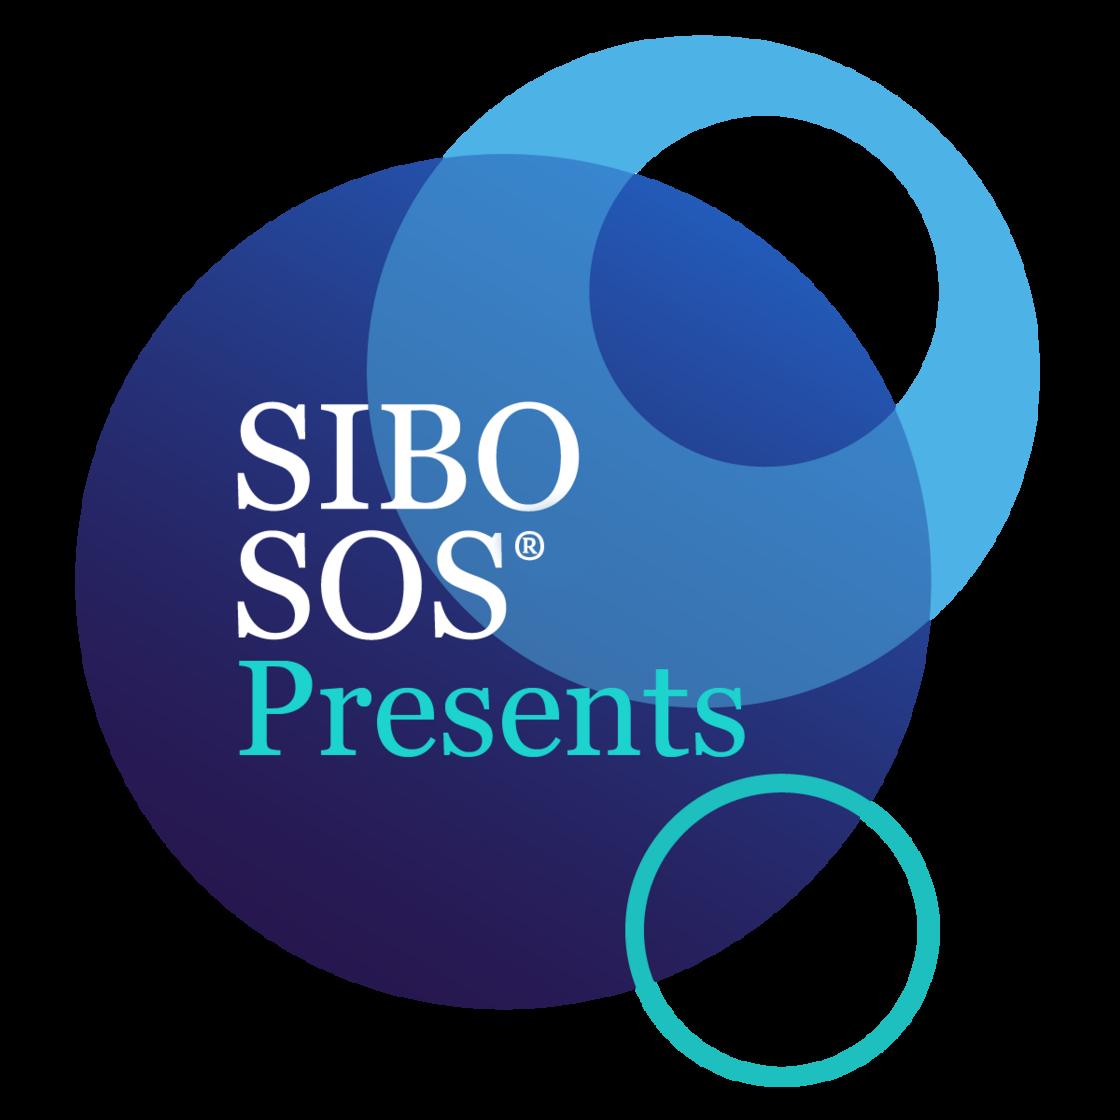 SIBO-SOS-PRESENTS